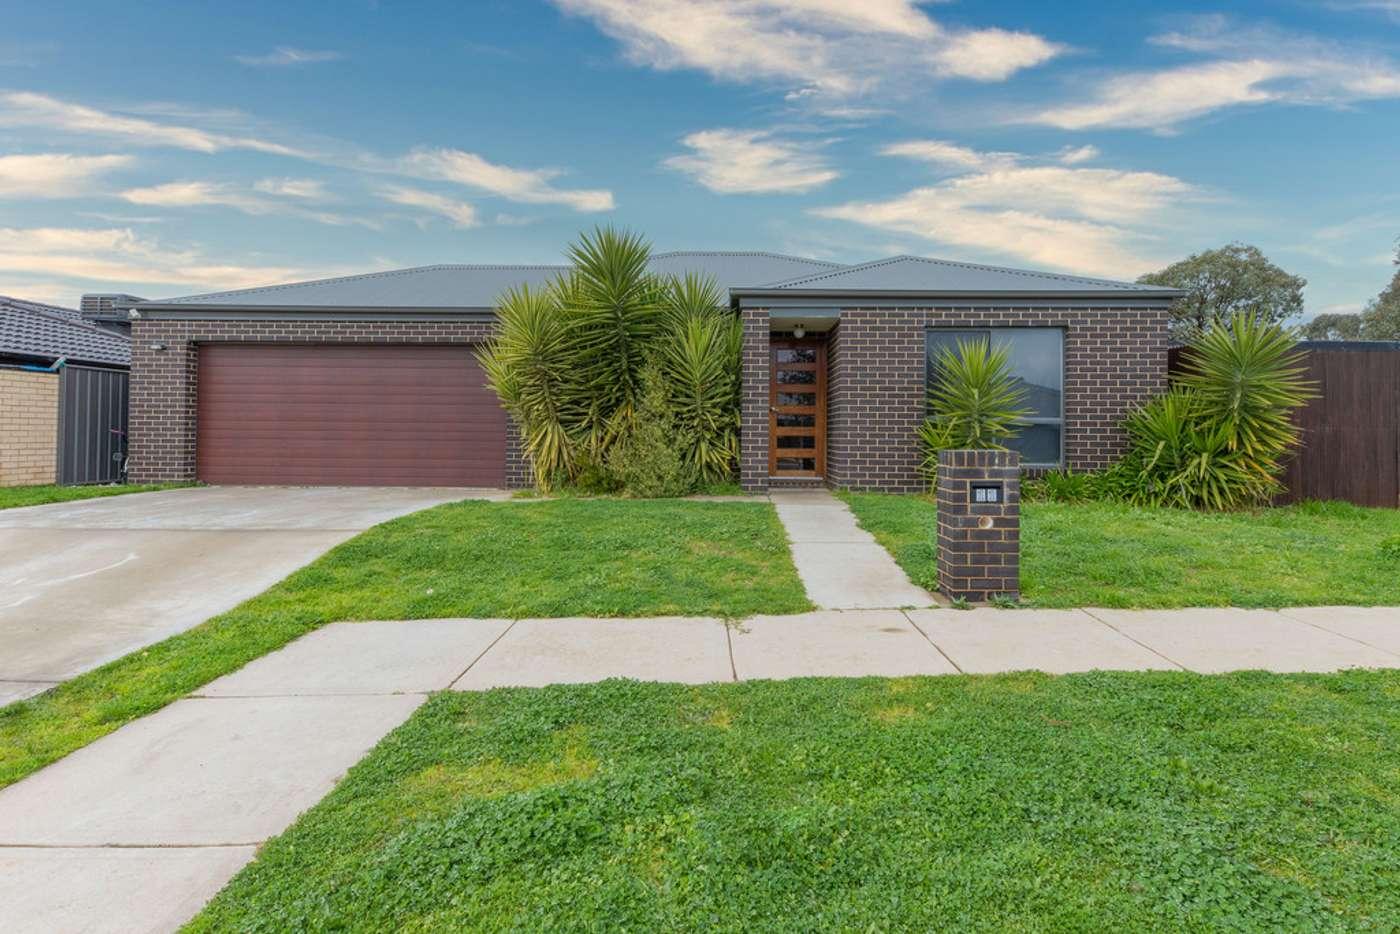 Main view of Homely house listing, 11 McAuliffe Street, Wodonga VIC 3690